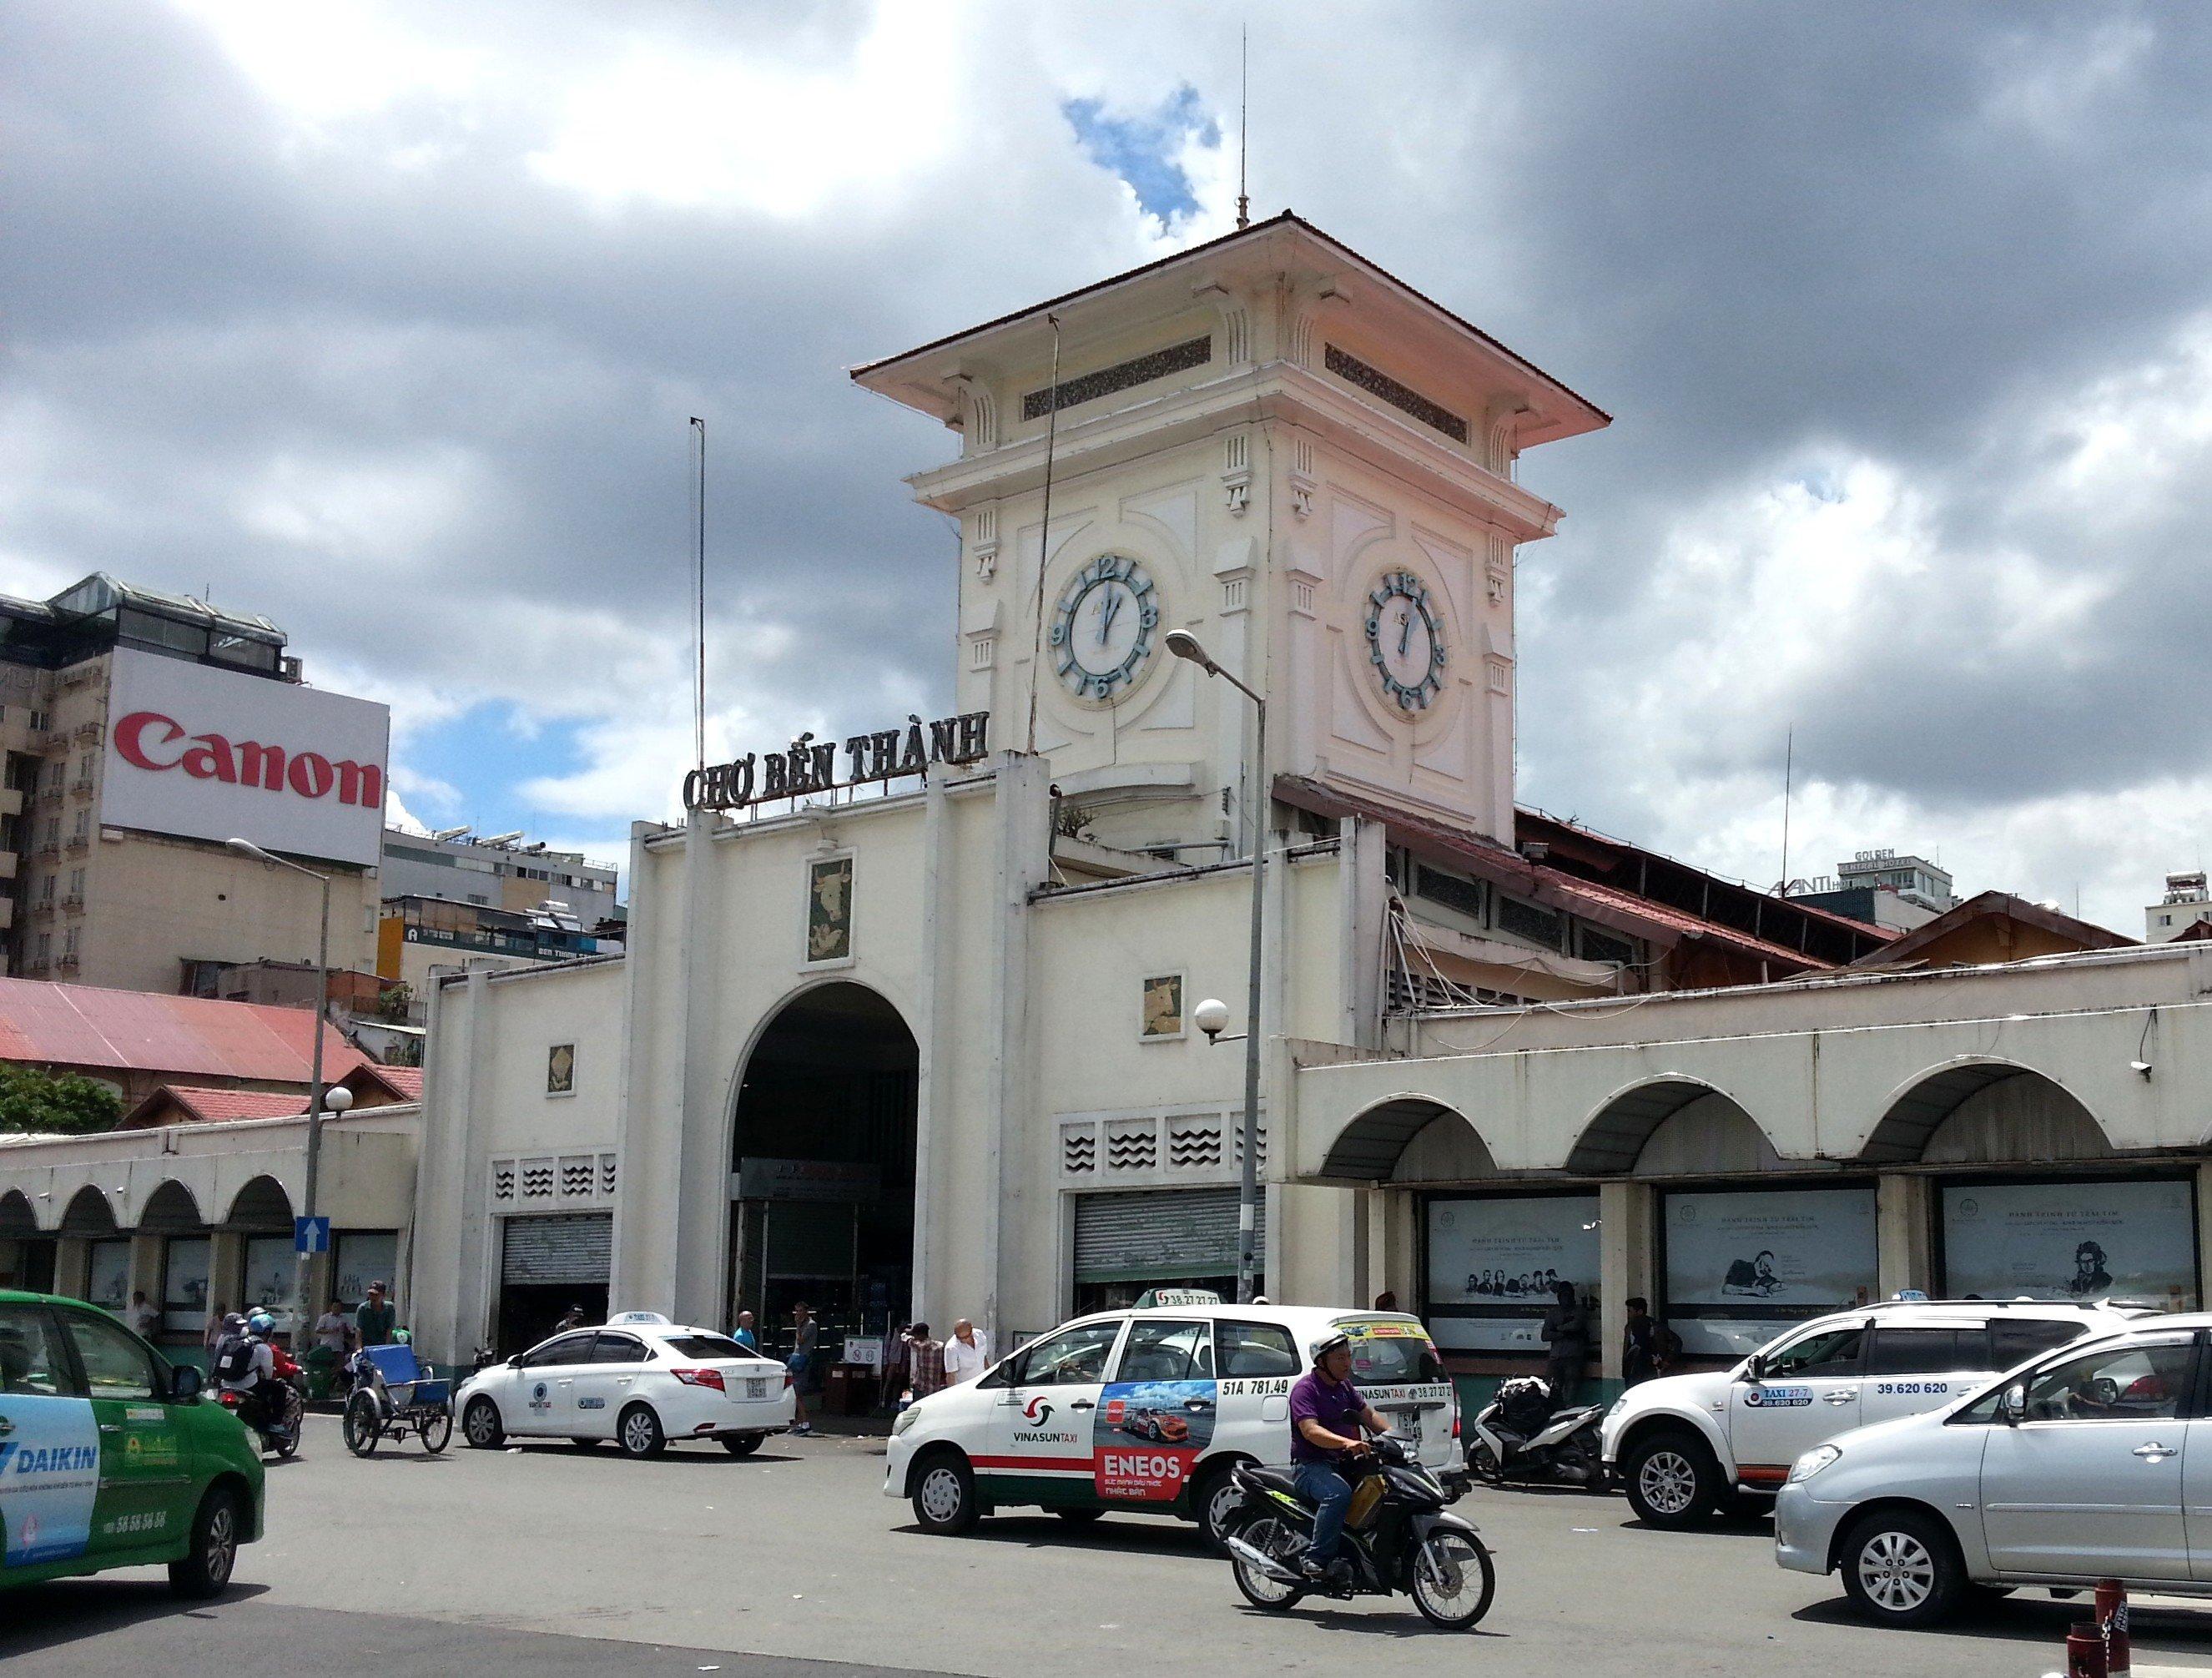 South Gate to Ben Thanh Market